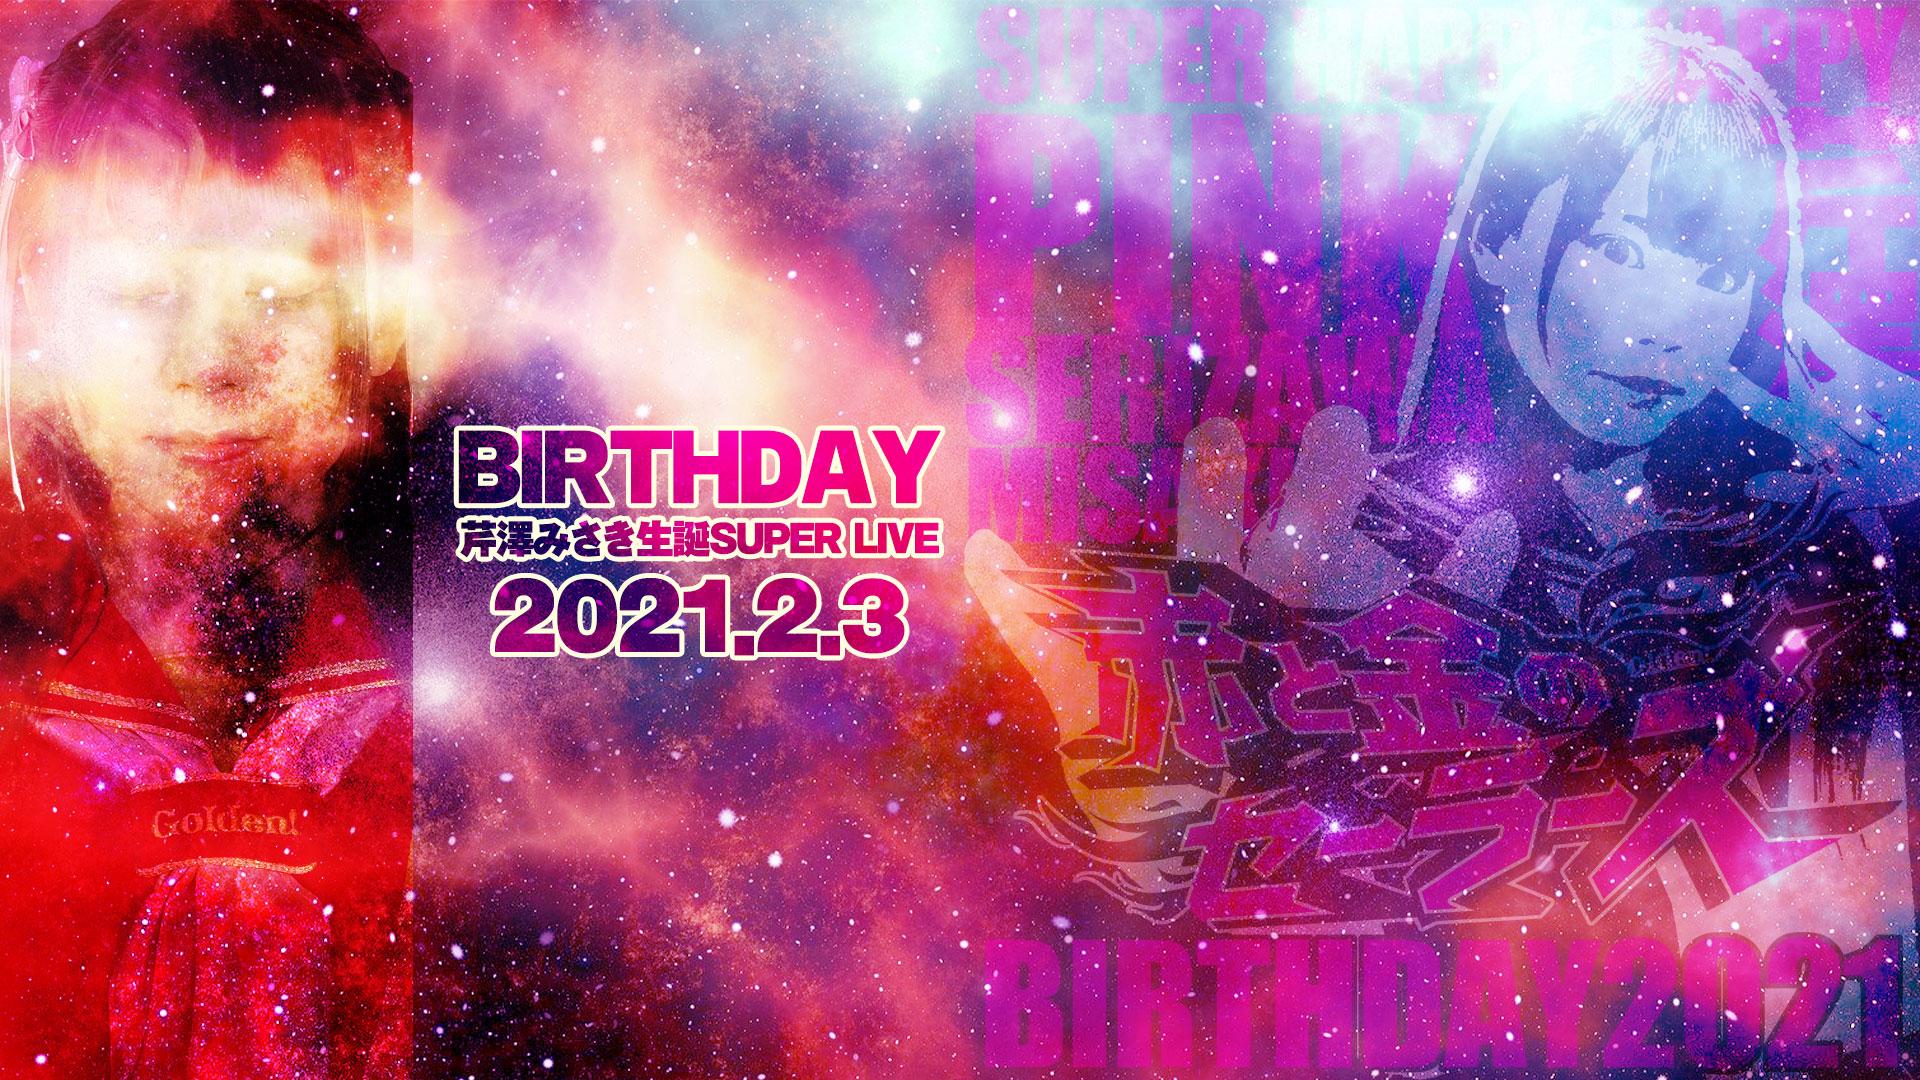 【LIVE】2月3日BIRTHDAY-芹澤みさき生誕SUPER LIVE-